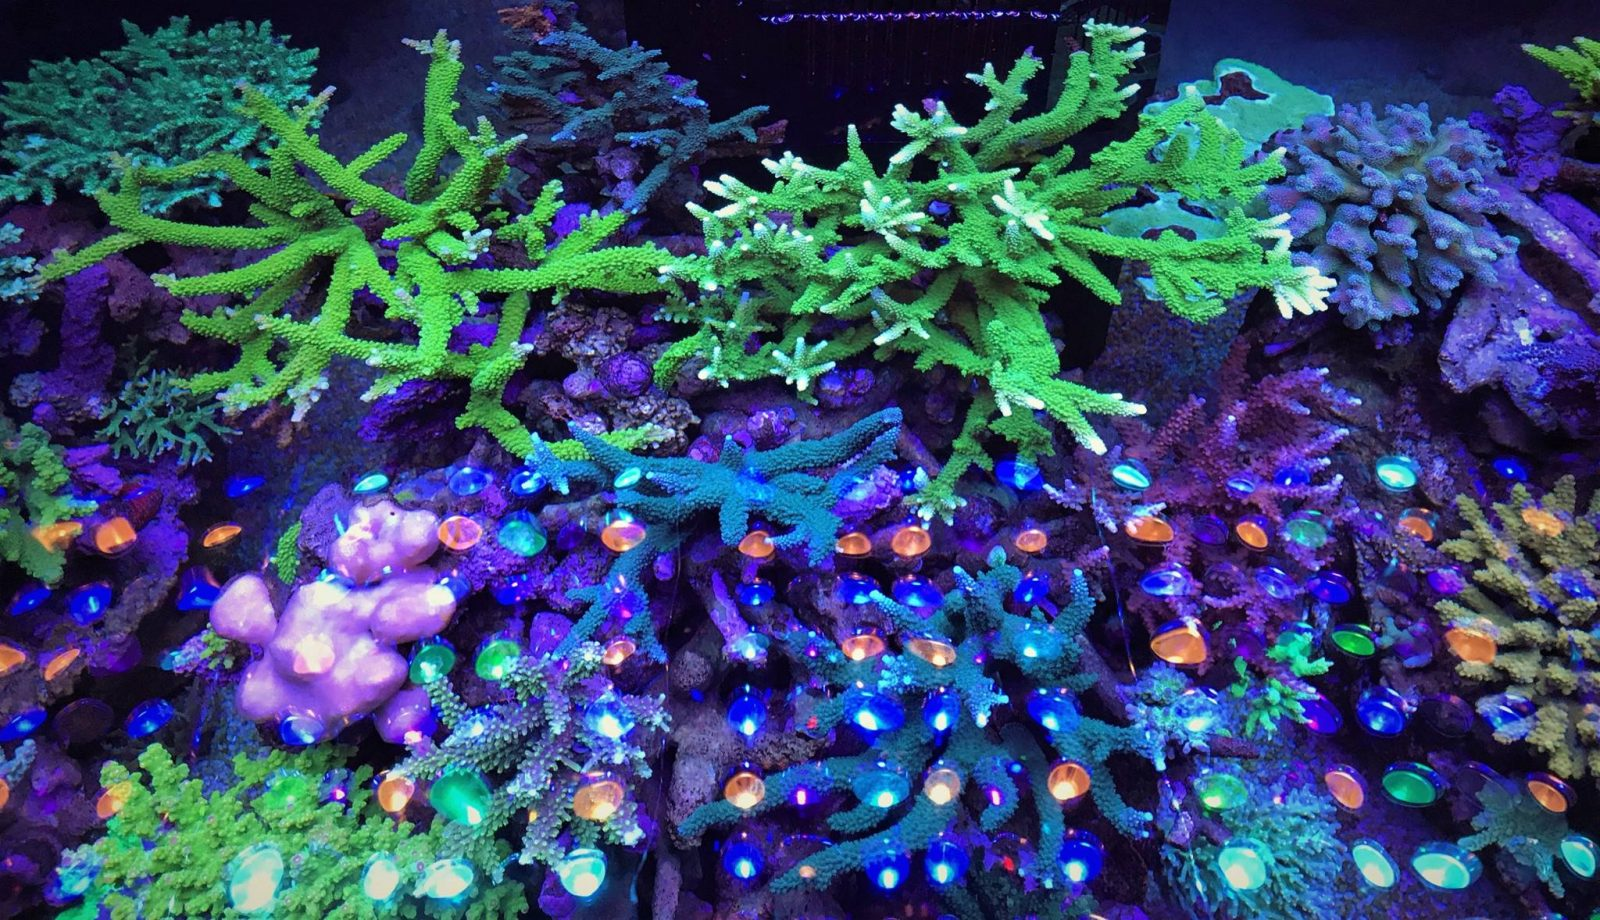 orphek saltvatten akvarium belysning